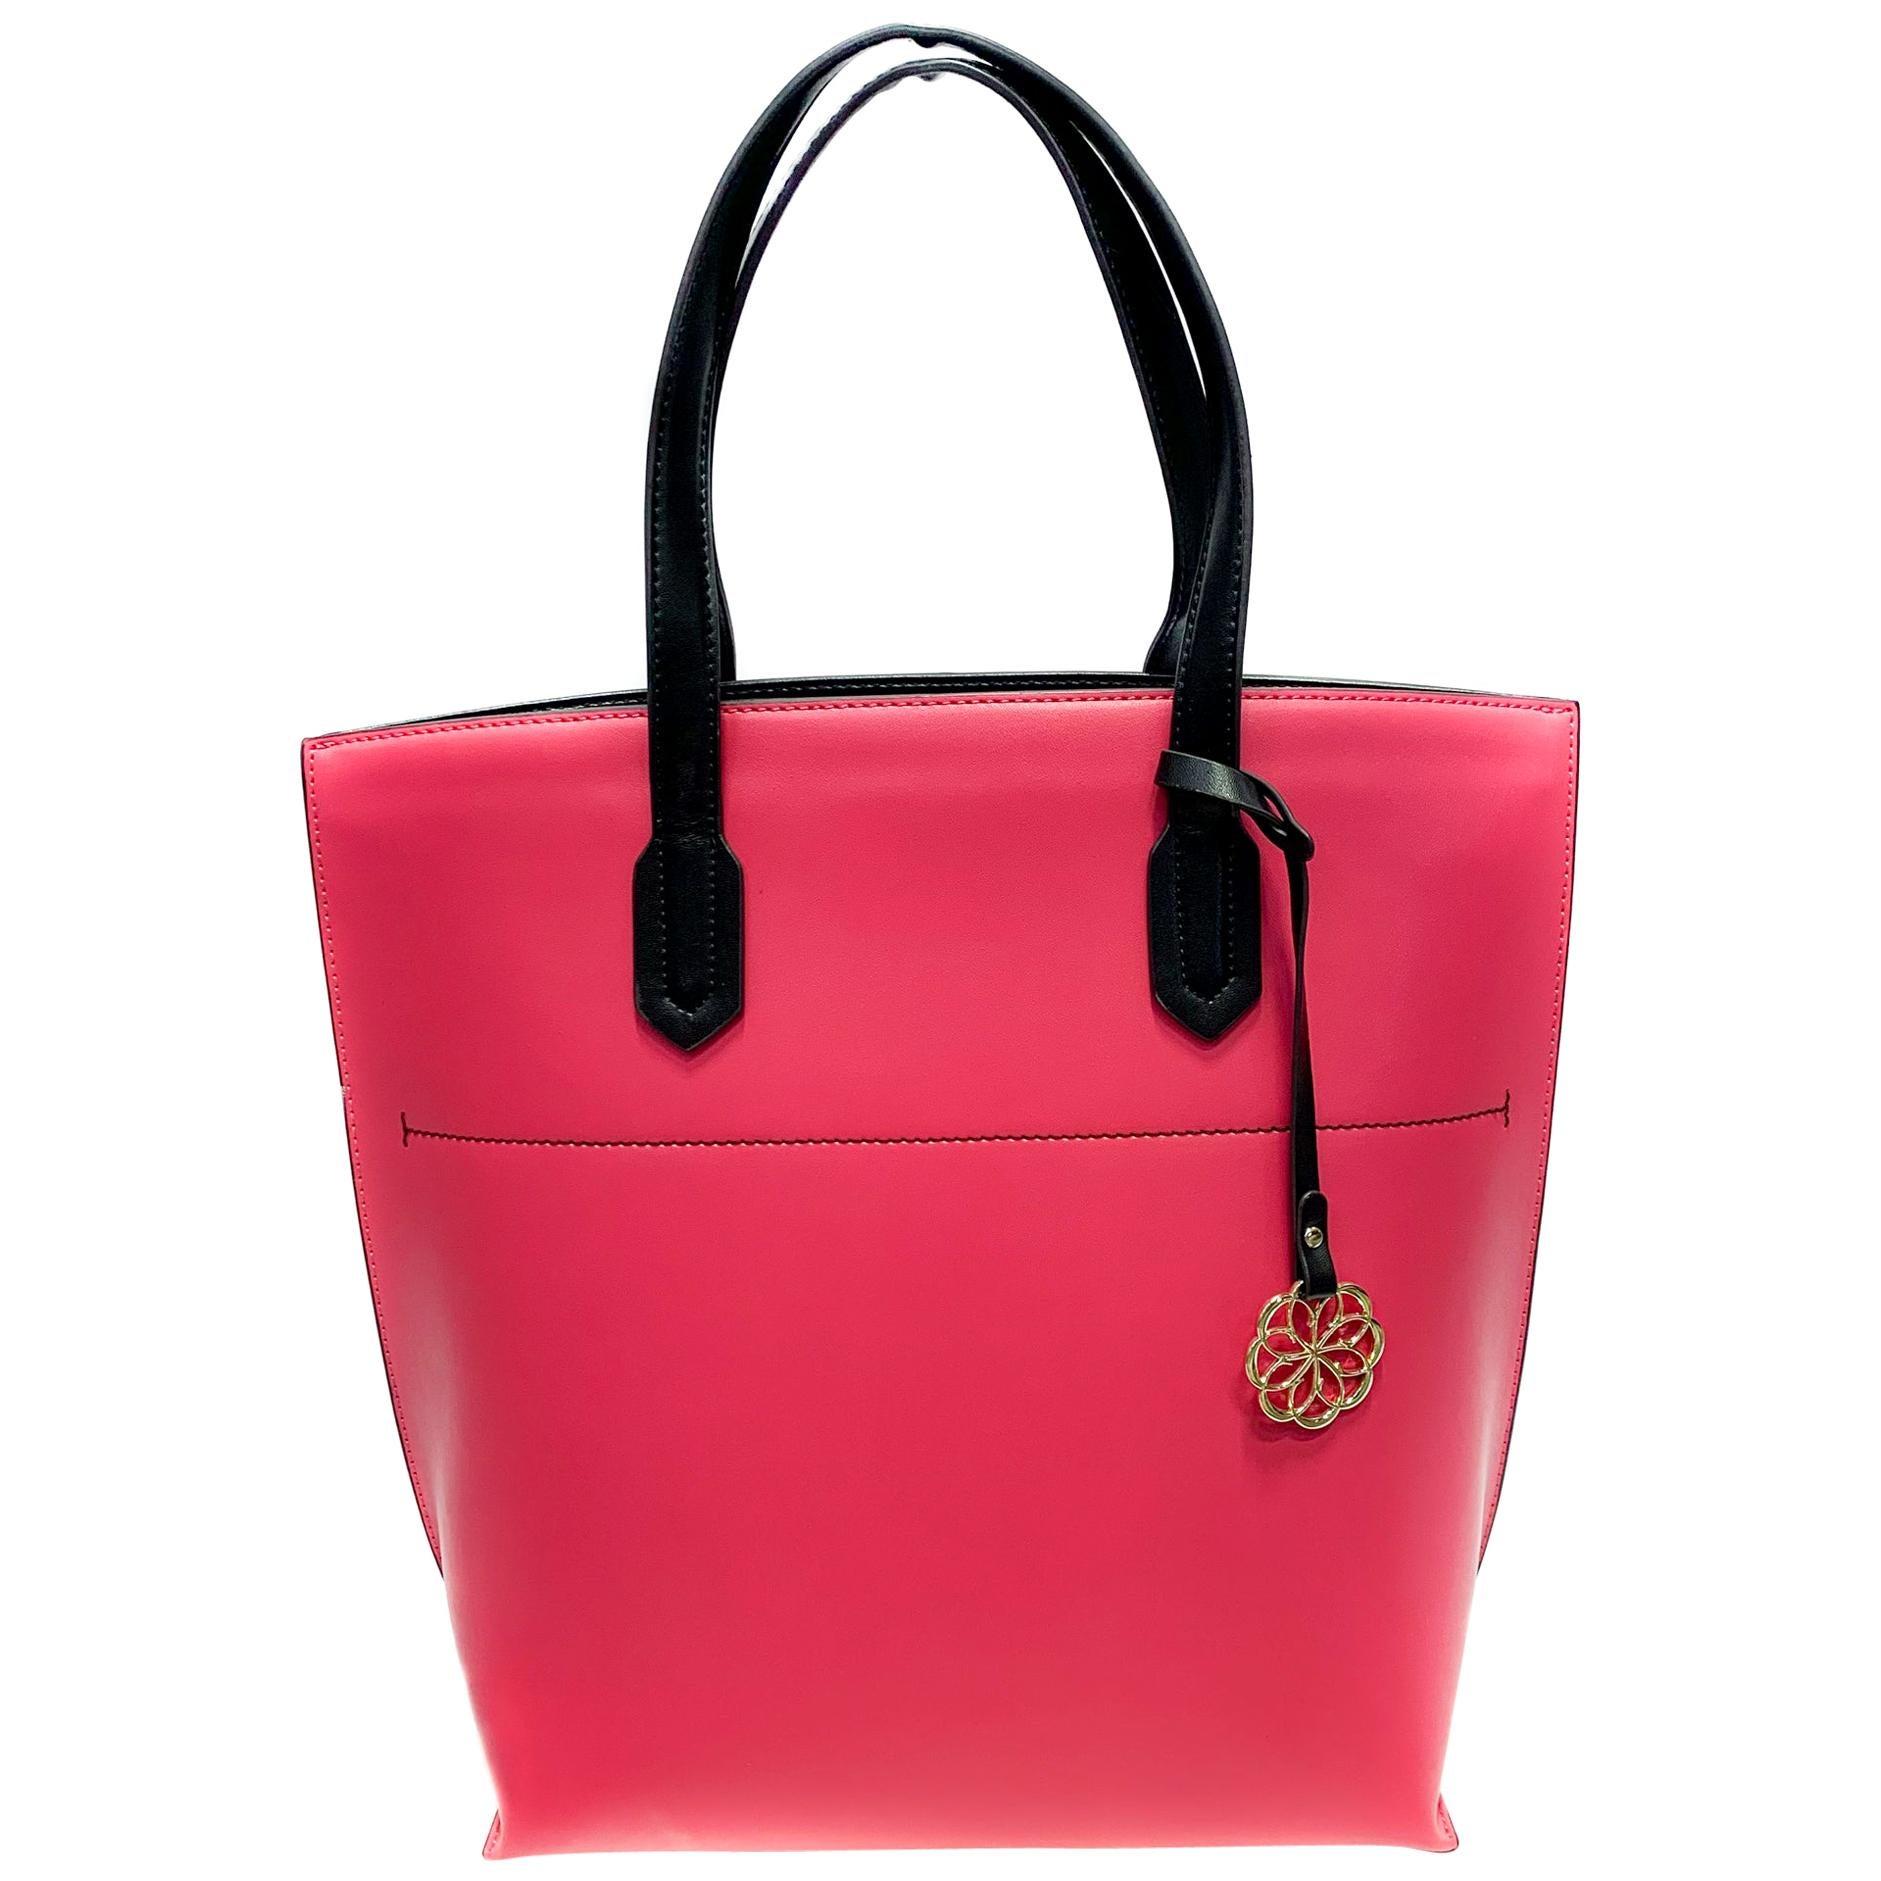 Cristina Sabatini Mallory Tote Handbag in Fusia